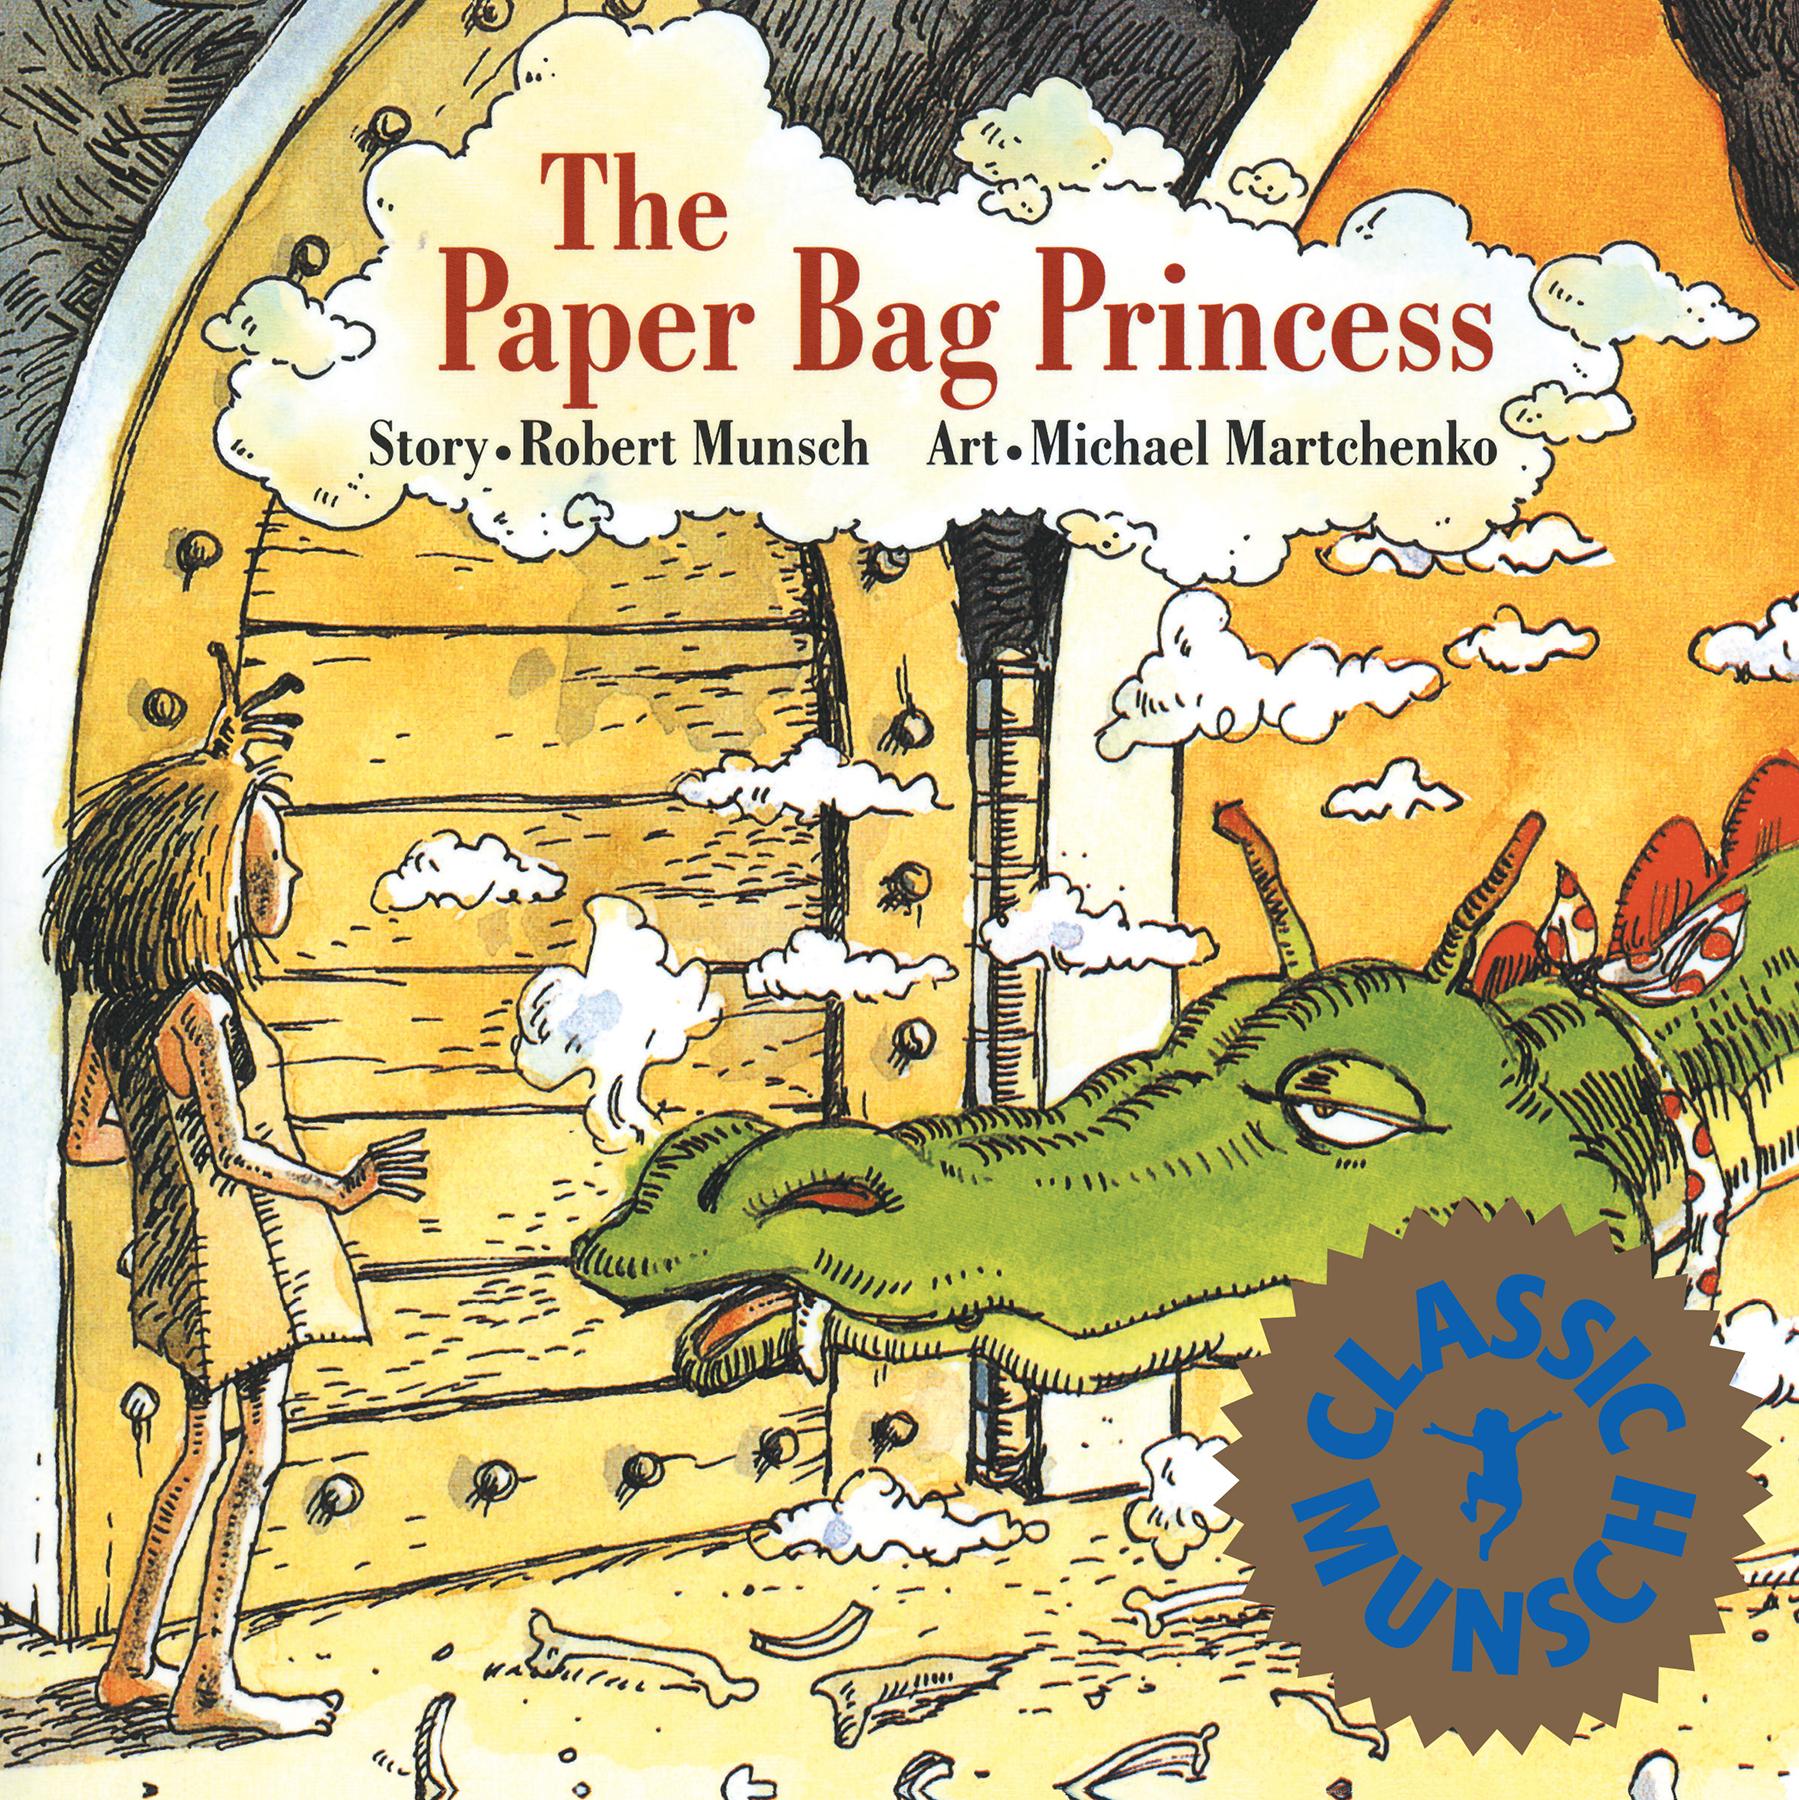 The Paper Bag Princess written by Robert Munsch, illustrated by Michael Martchenko